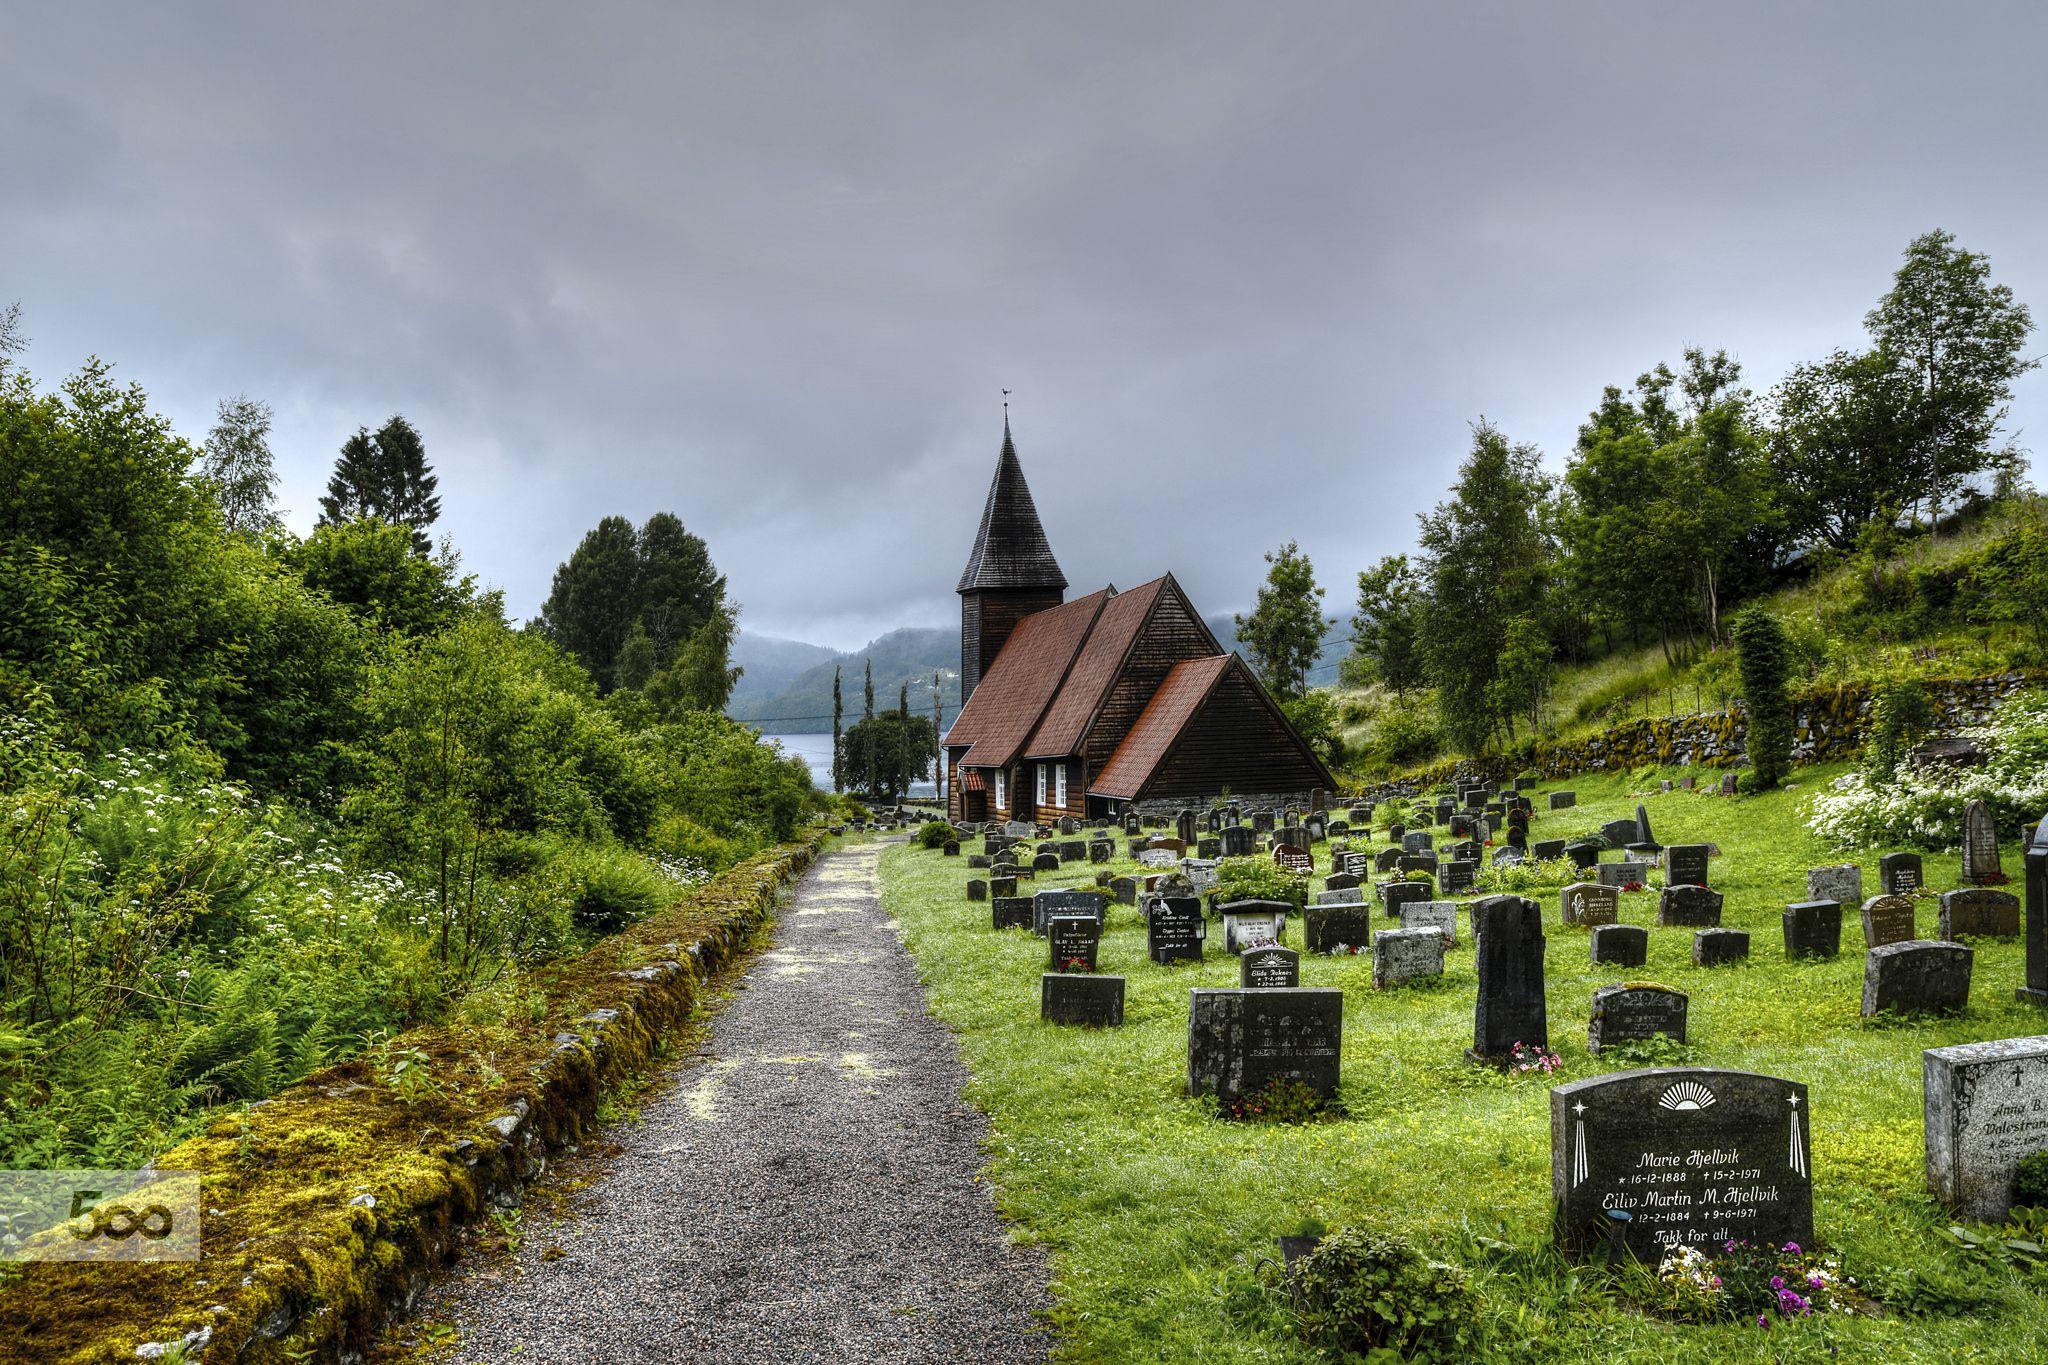 Hamre Osterøy